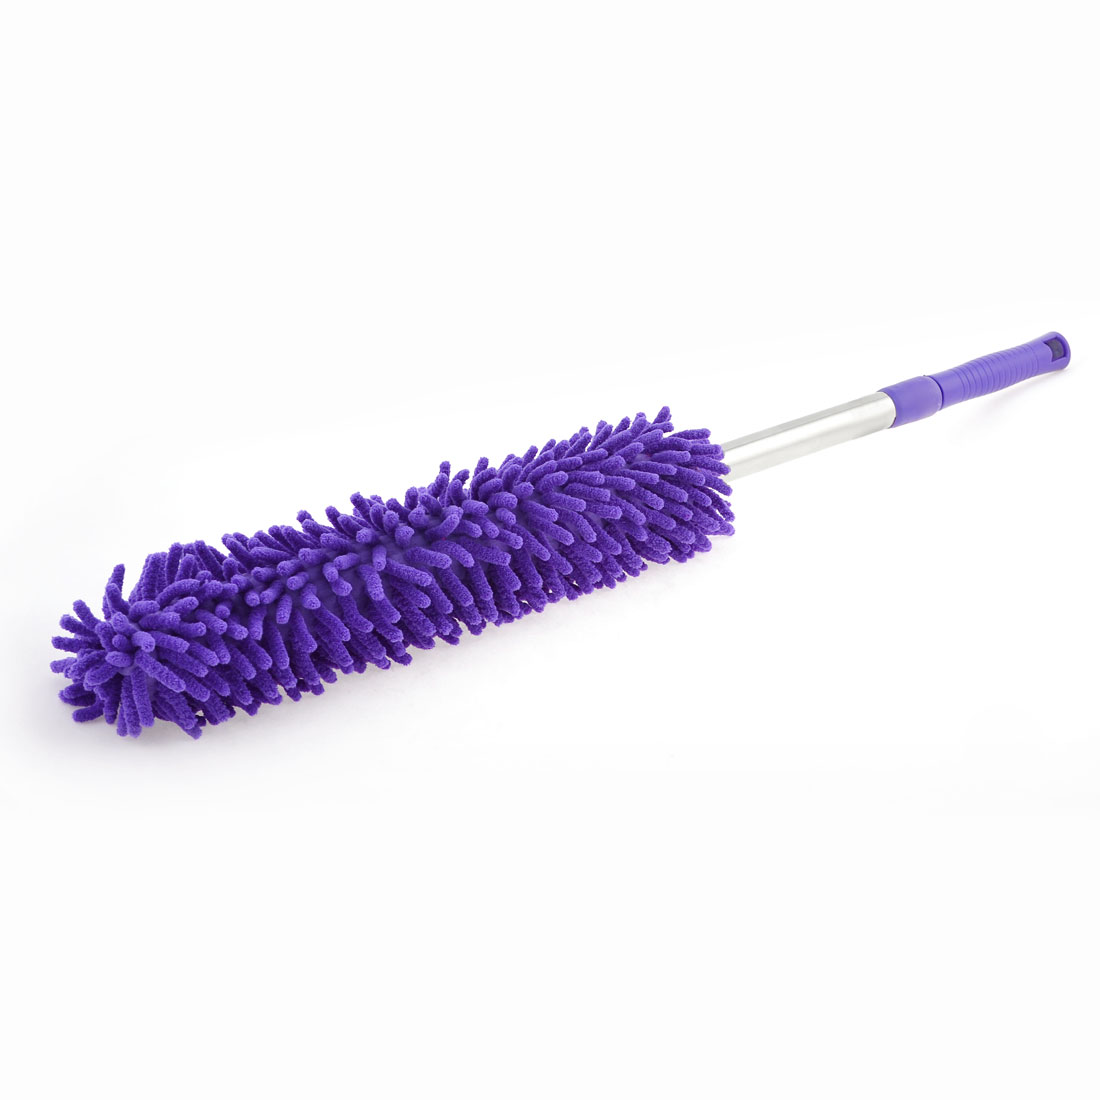 "24.8"" Length Purple Plastic Grip Car Microfiber Cleaning Dirt Wash Brush"